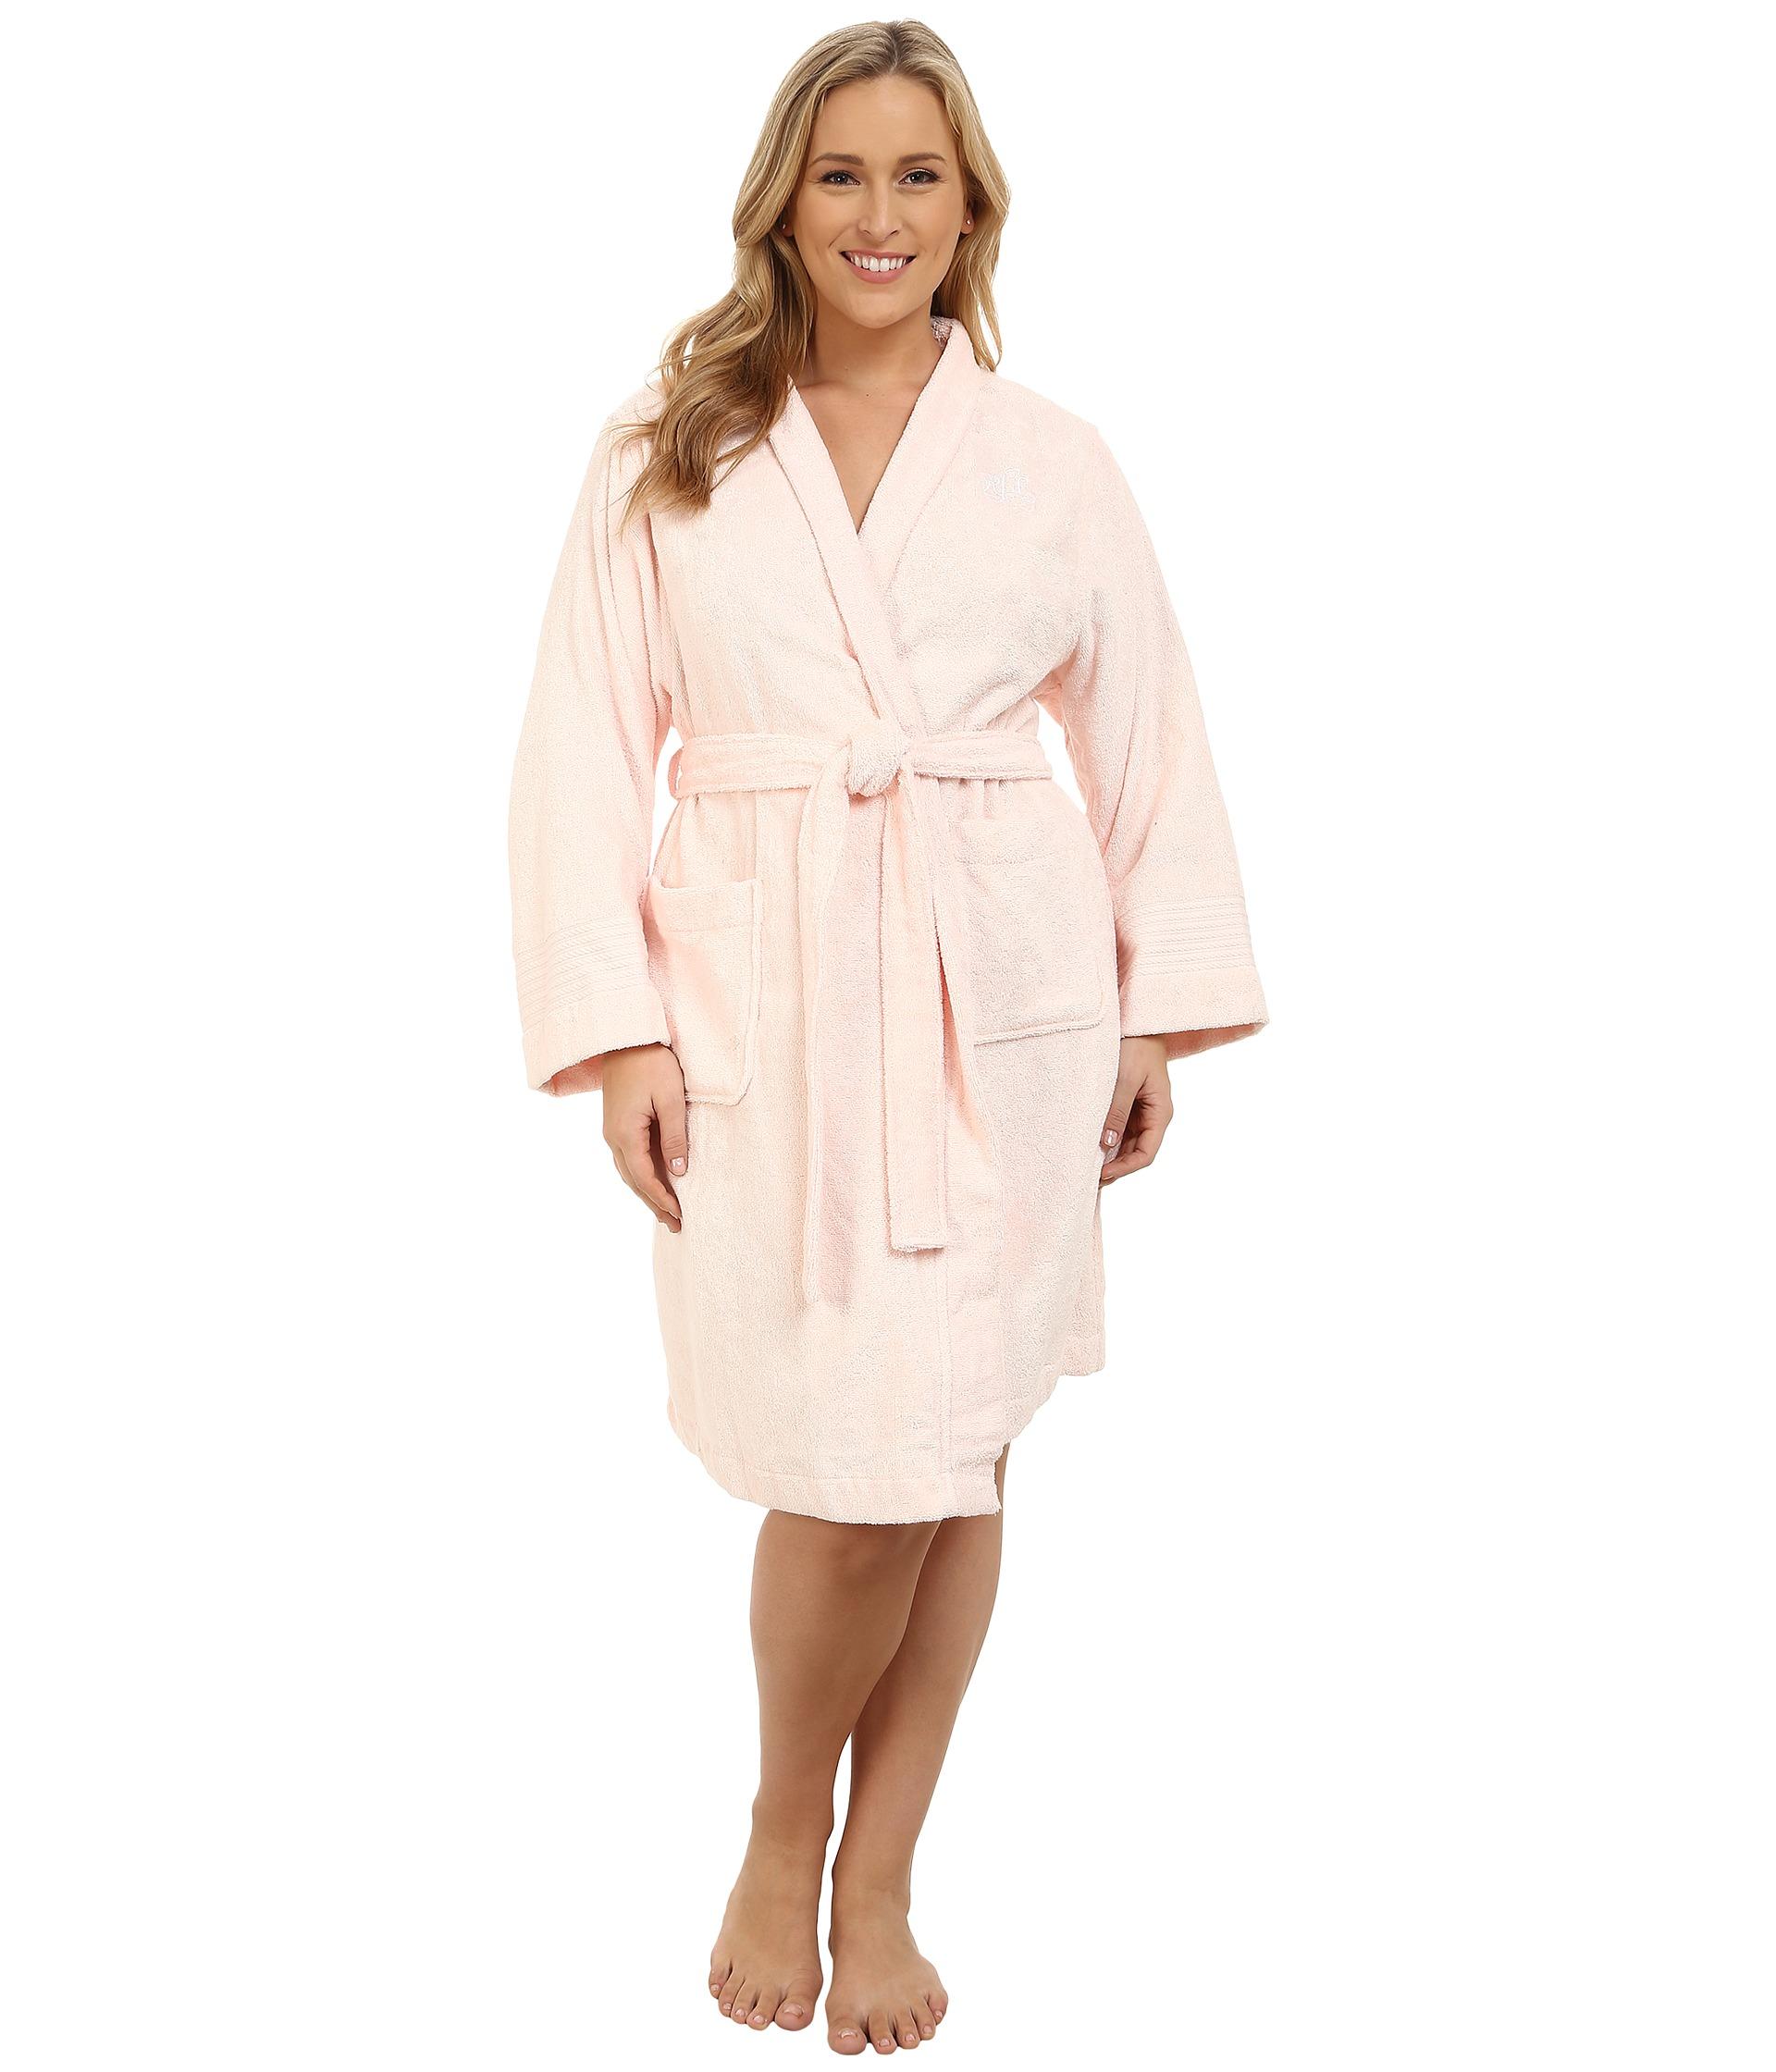 lauren ralph lauren plus size greenwich robe light pink free shipping both ways. Black Bedroom Furniture Sets. Home Design Ideas